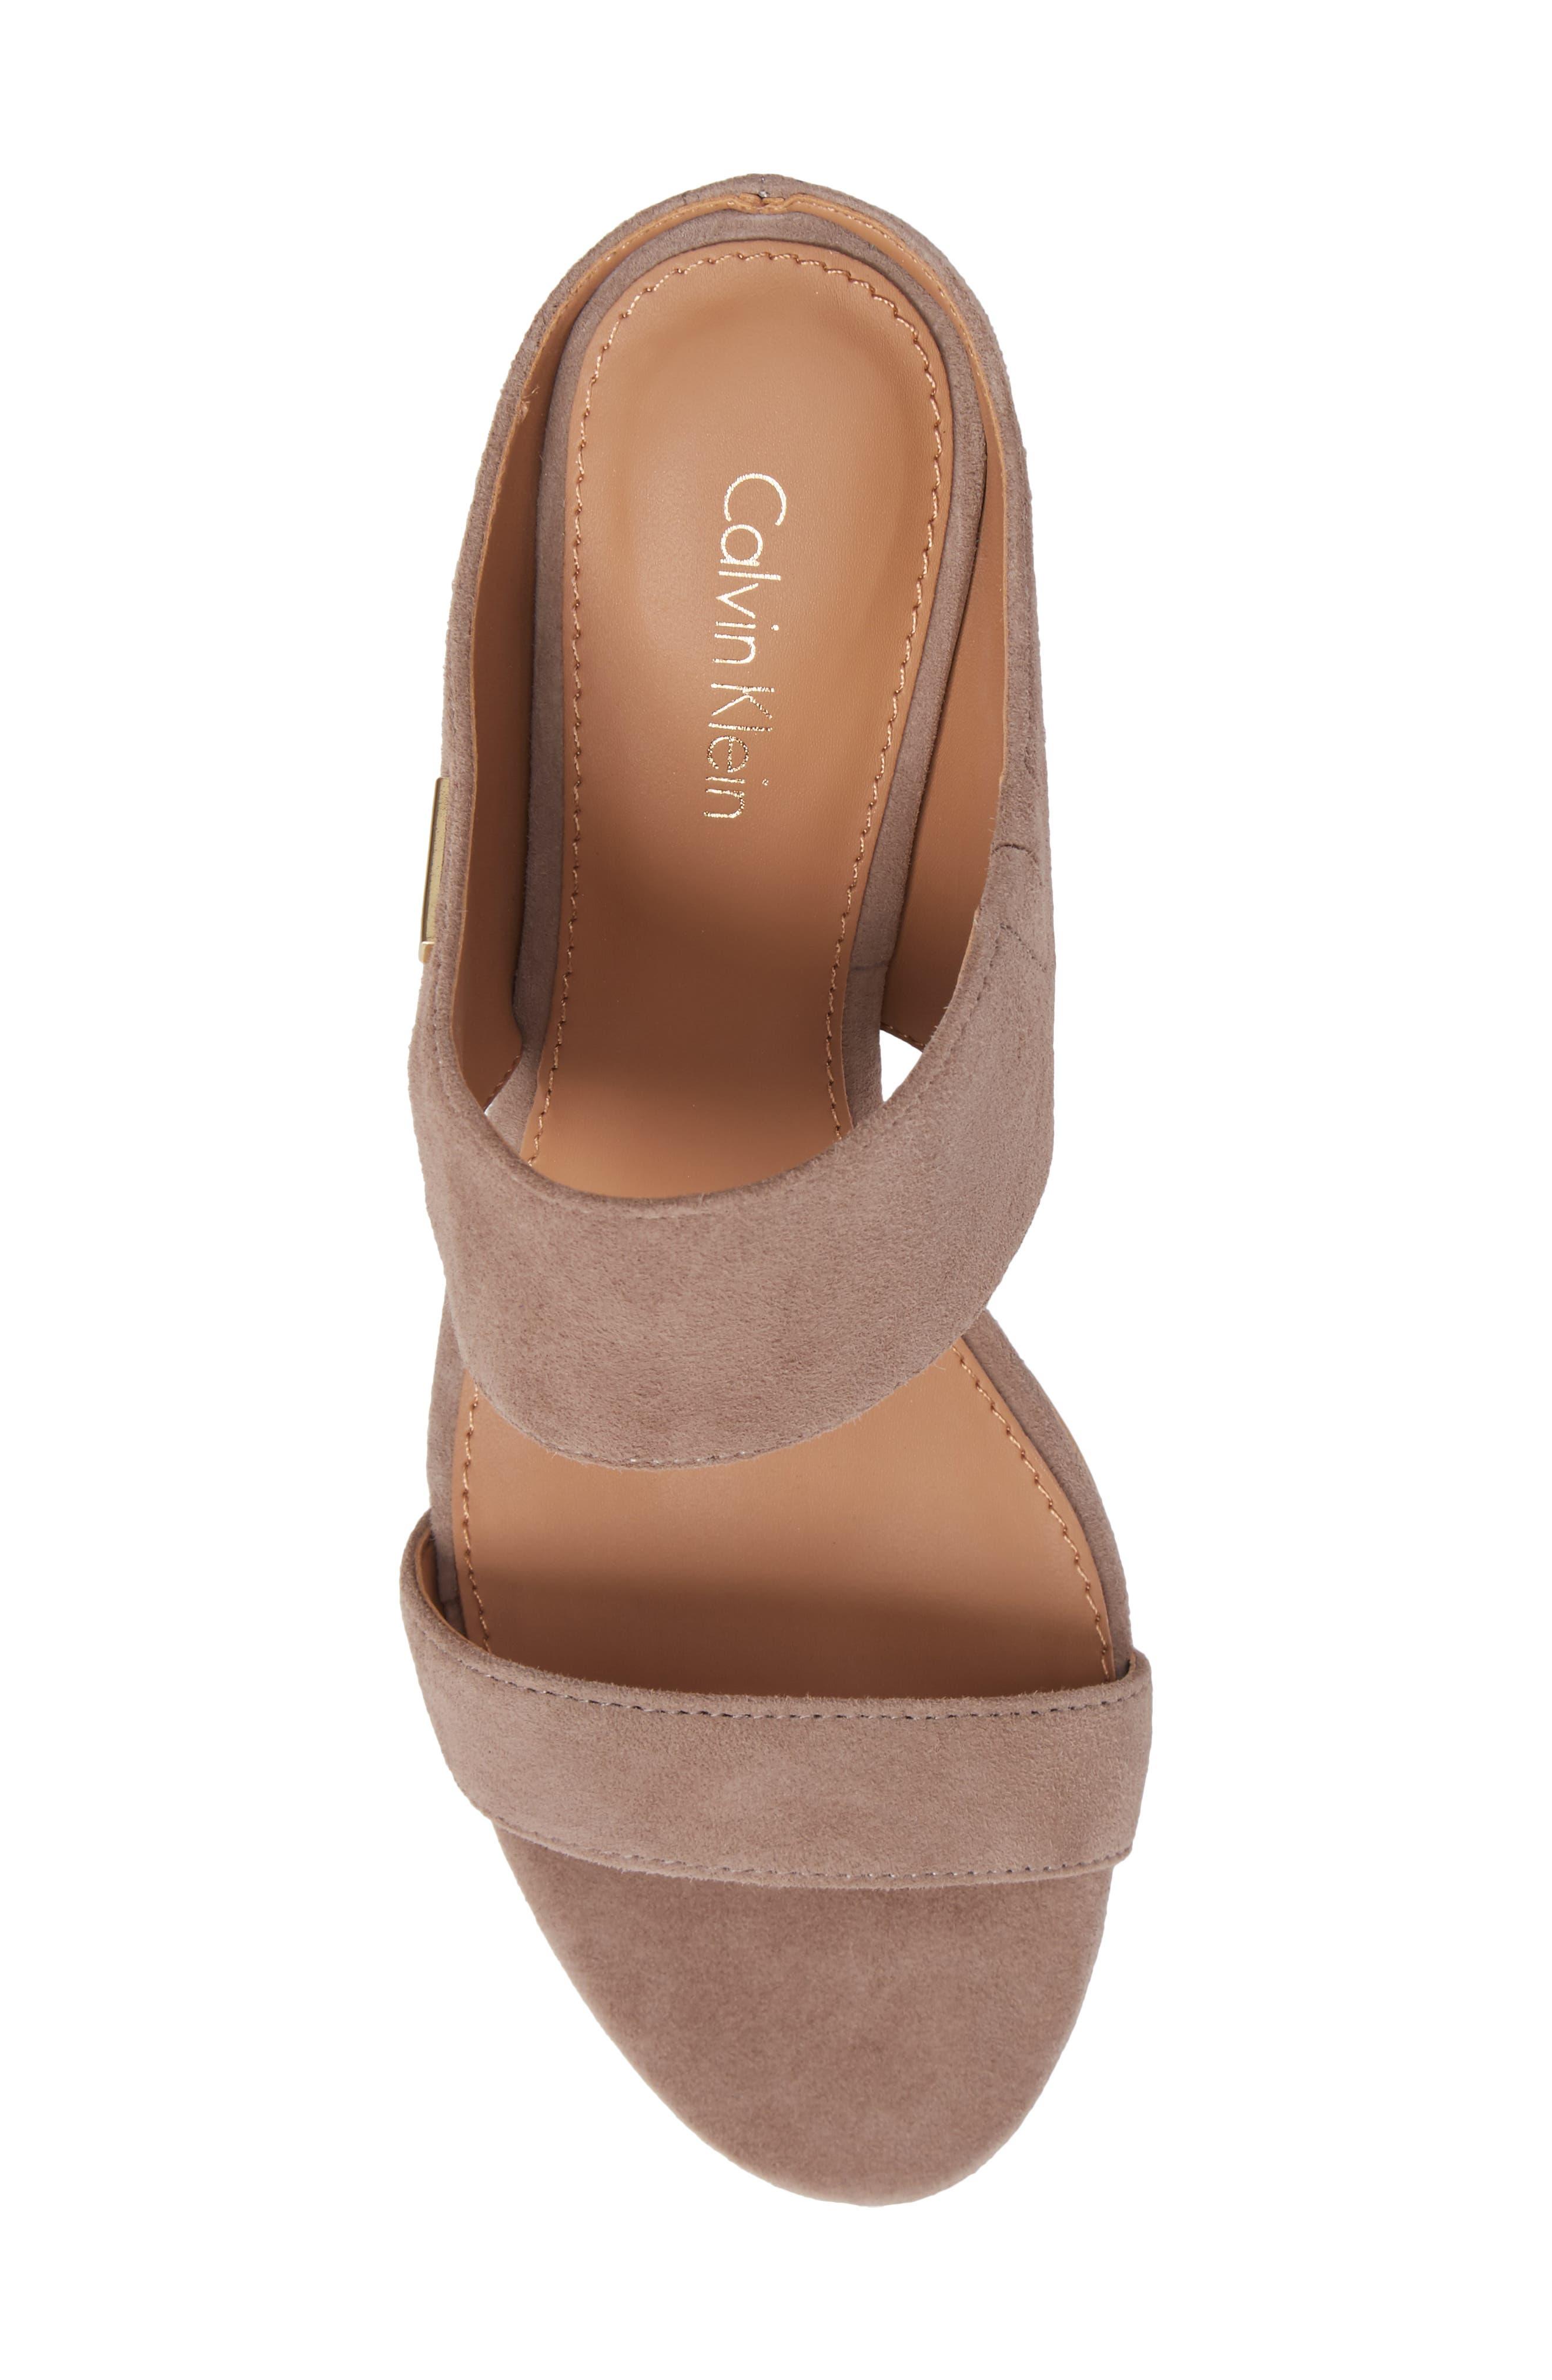 Phyllis Studded Wedge Sandal,                             Alternate thumbnail 18, color,